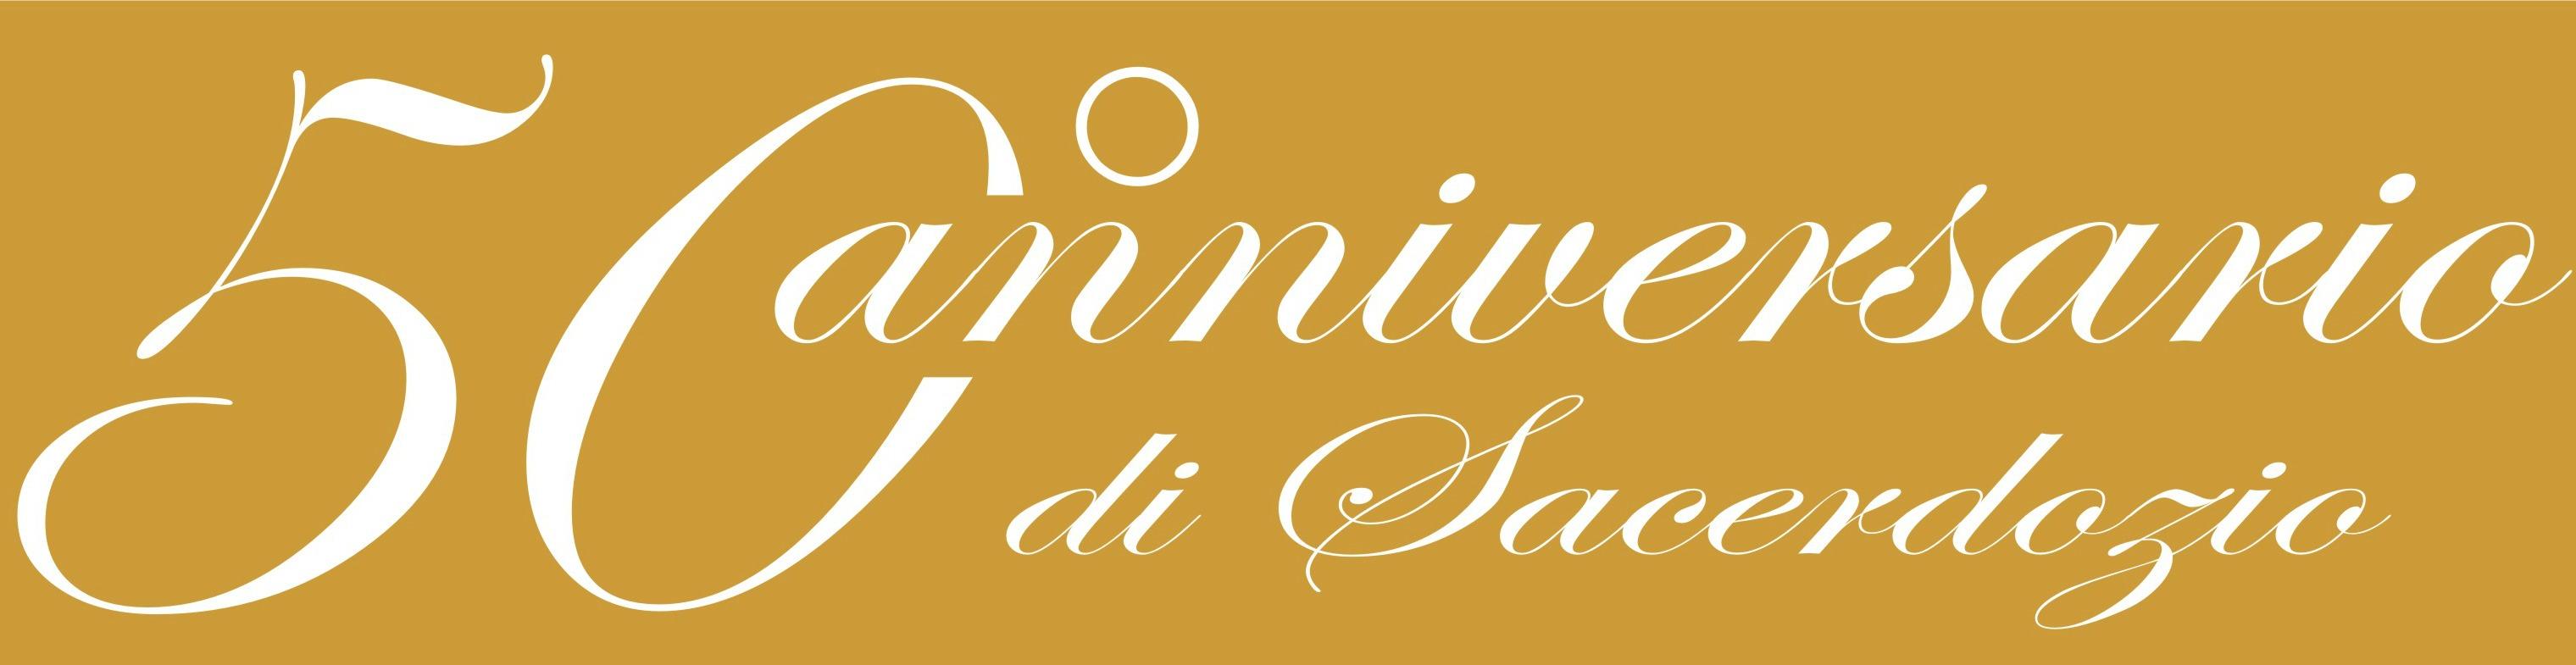 50° Anniversario di Sacerdozio